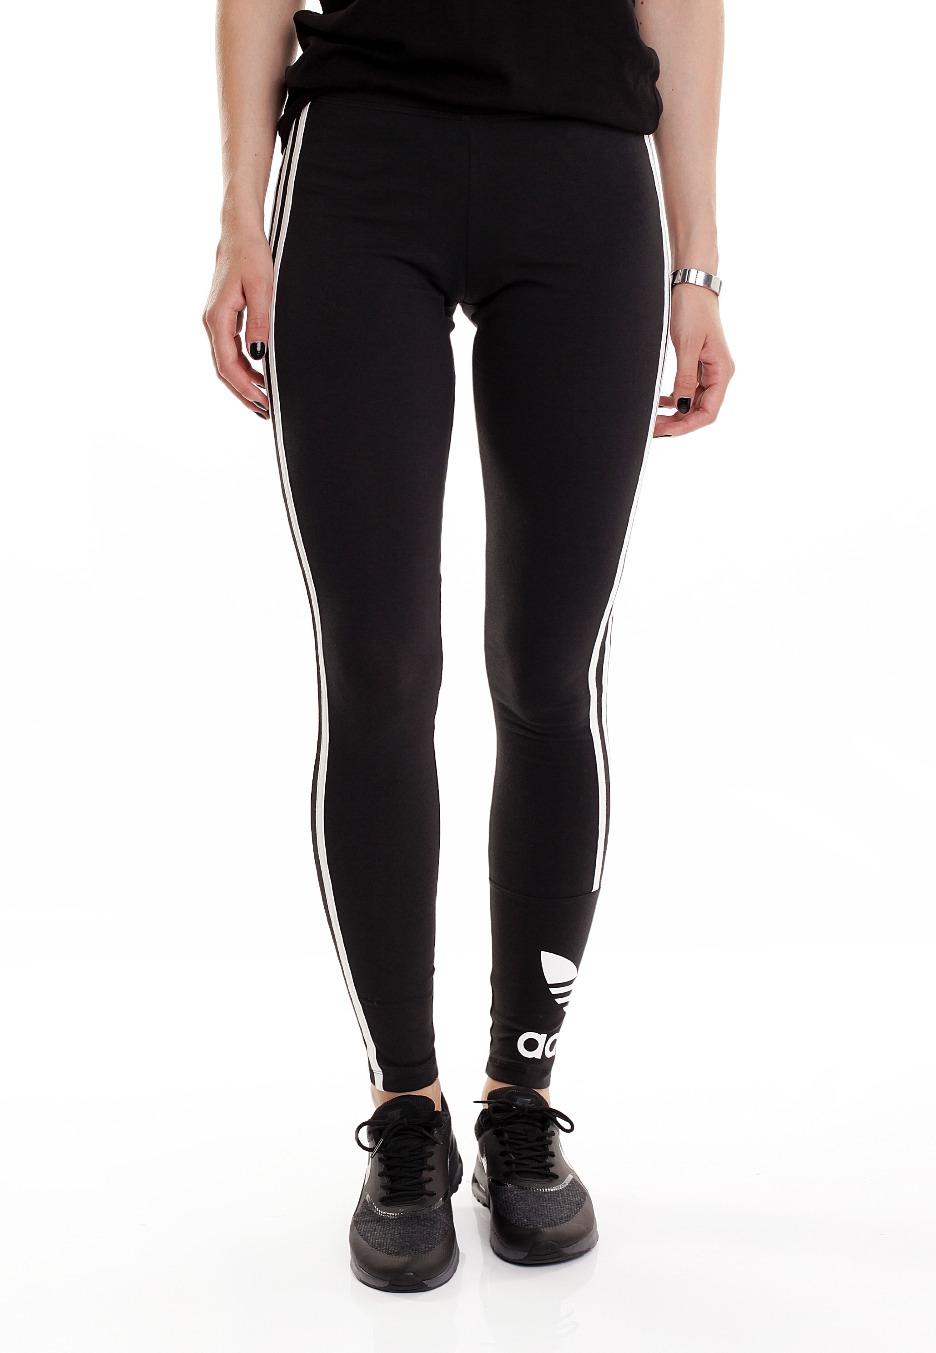 Adidas - Trefoil Stripes Black/Core White